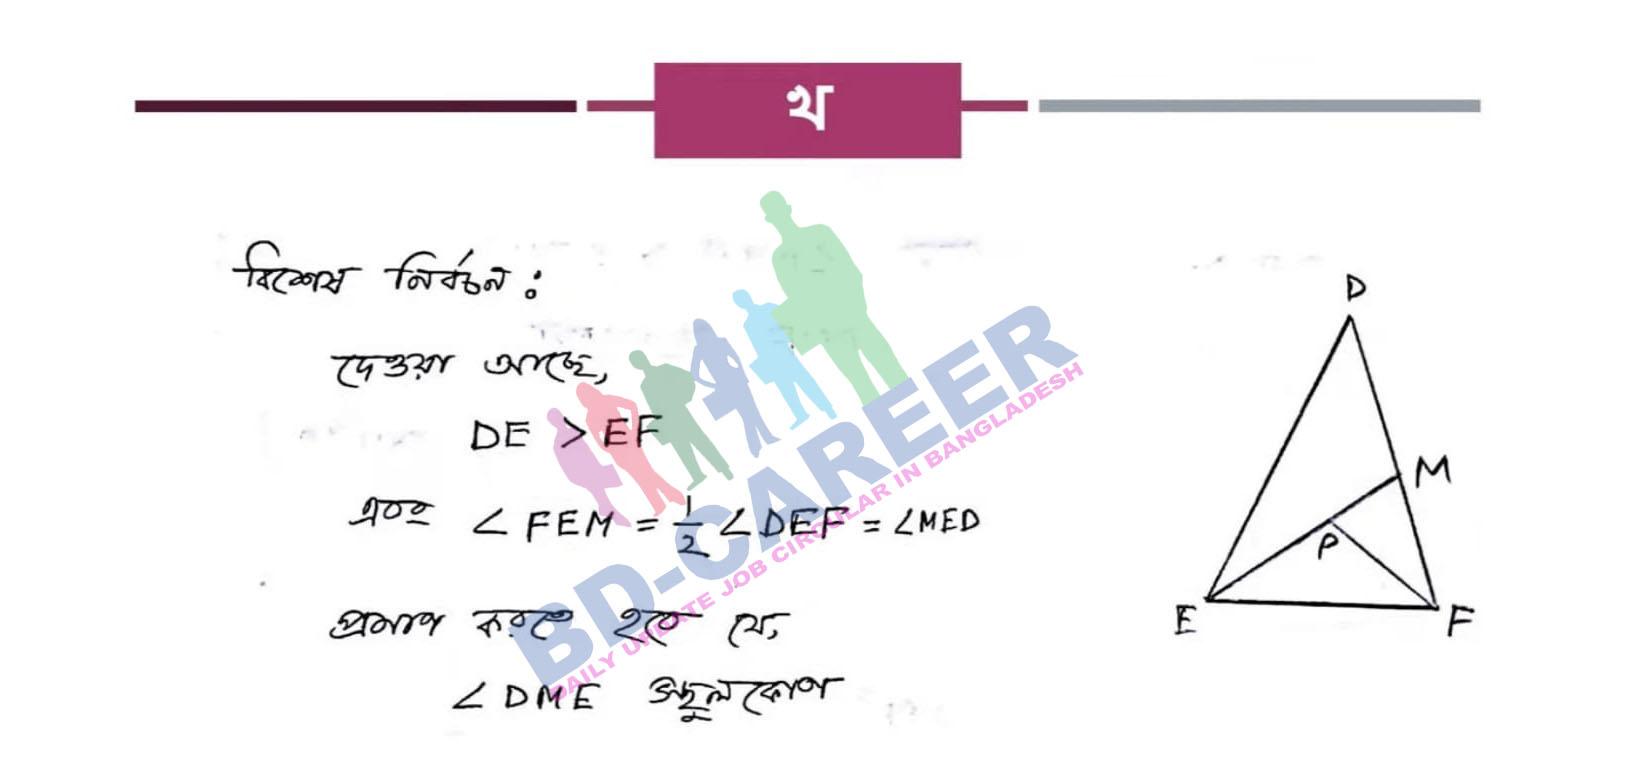 assigment-4th-class-9-math-answer-2020-08